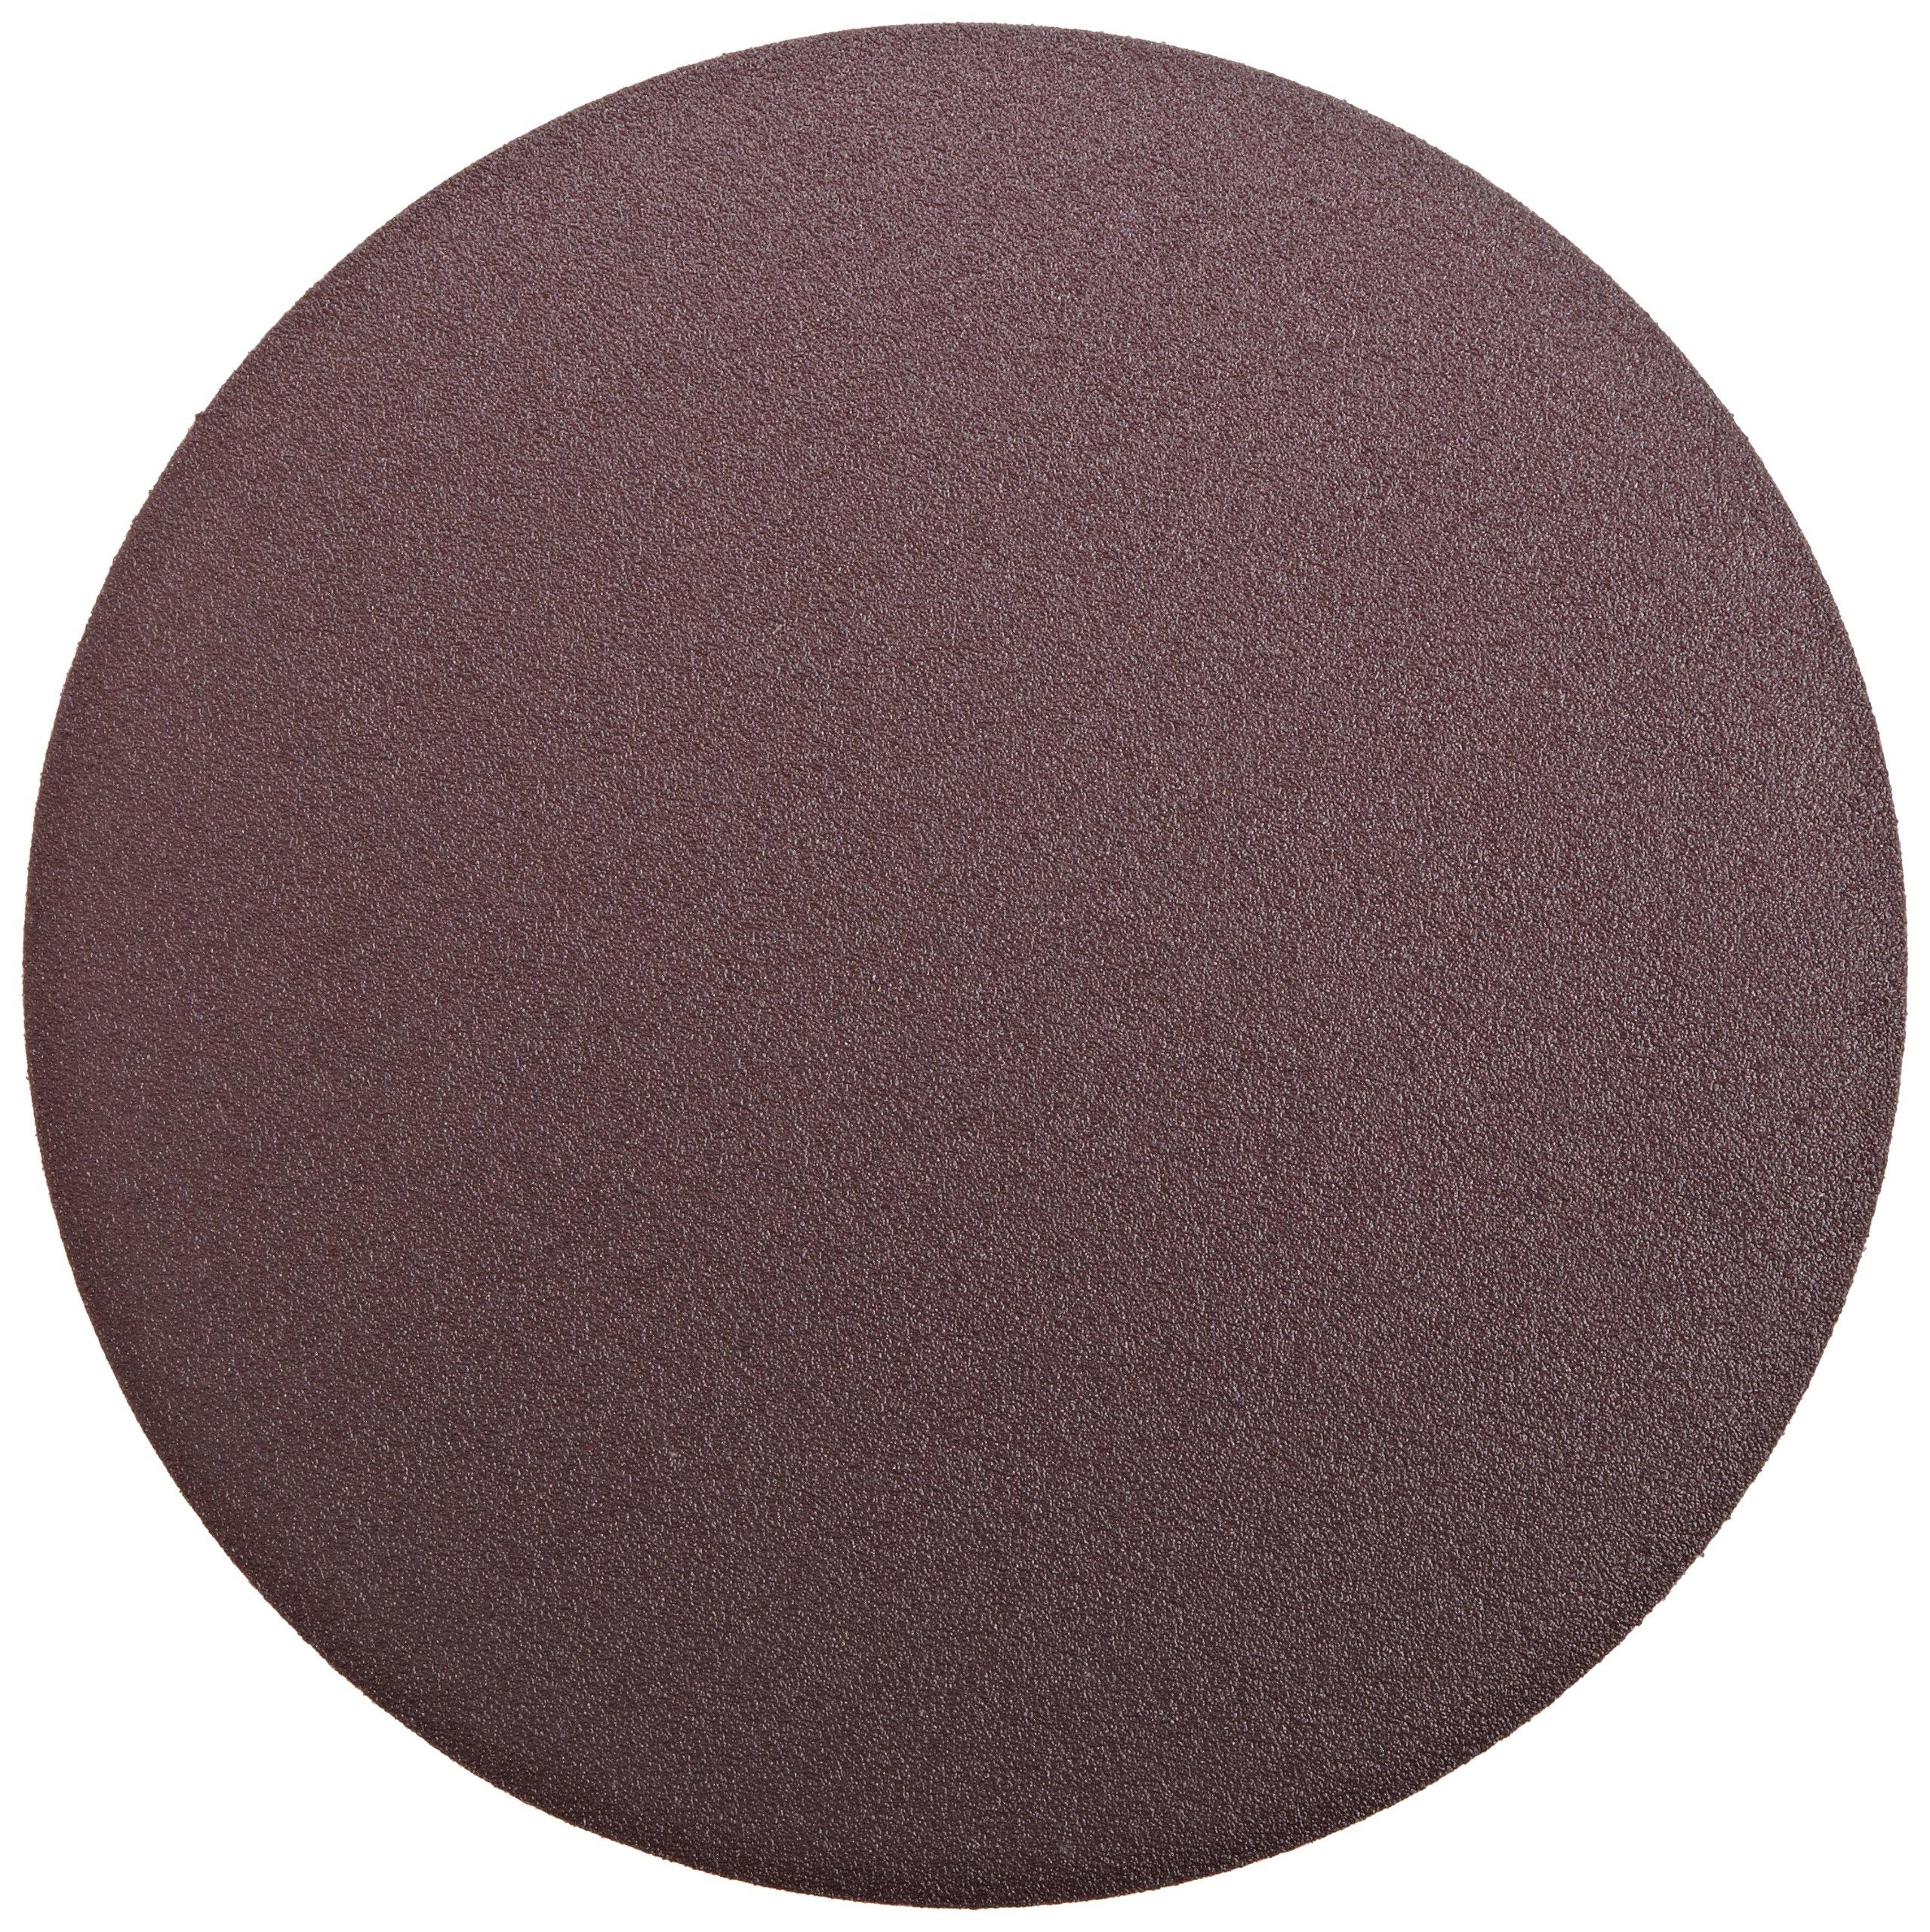 3M  PSA Cloth Disc 348D, X Weight Cloth, PSA Attachment, Aluminum Oxide, 12'' Diameter, 60 Grit, Brown (Pack of 10) by Cubitron